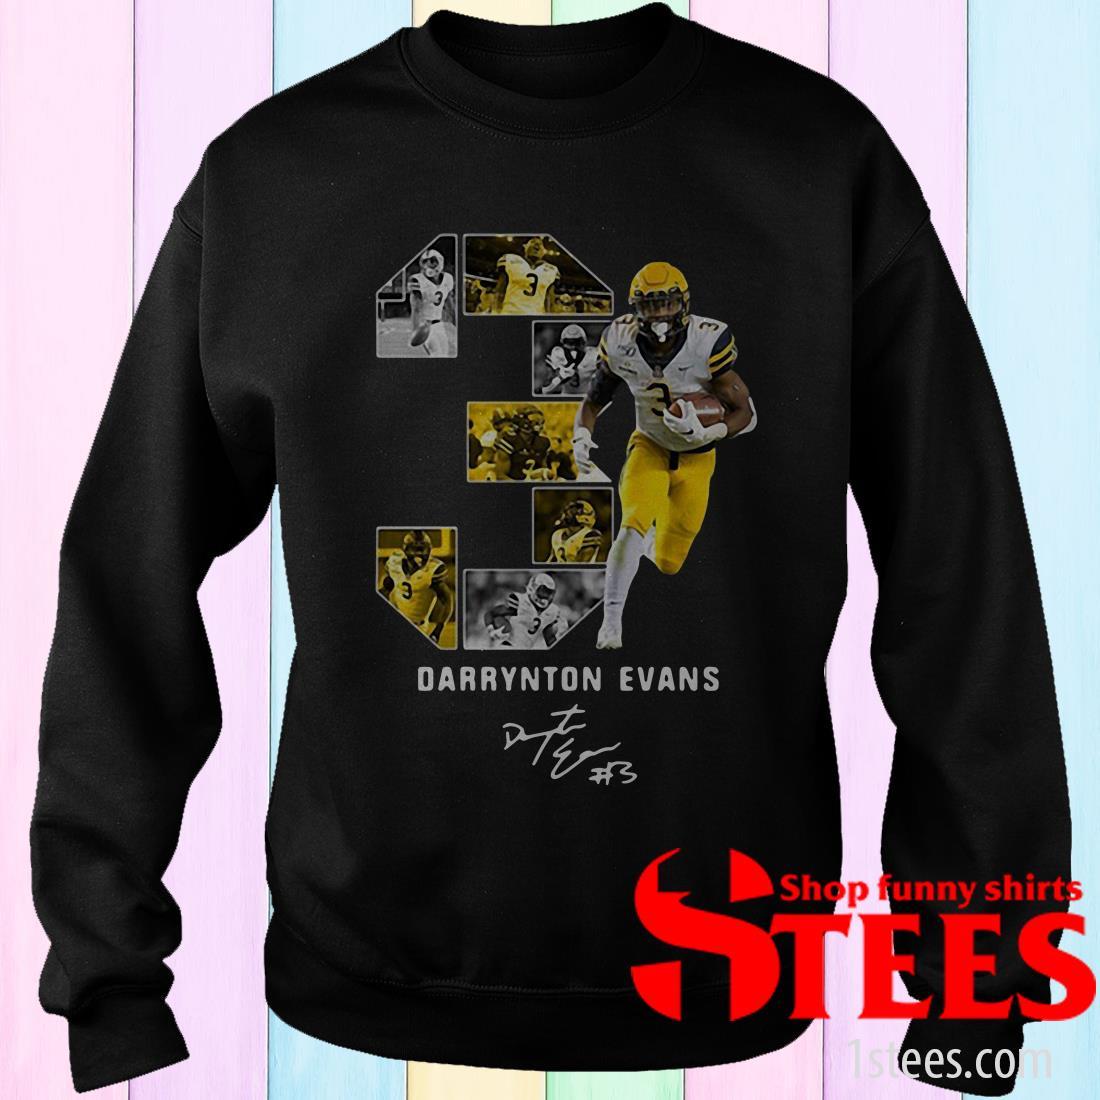 03 Darrynton Evans Signature Shirt